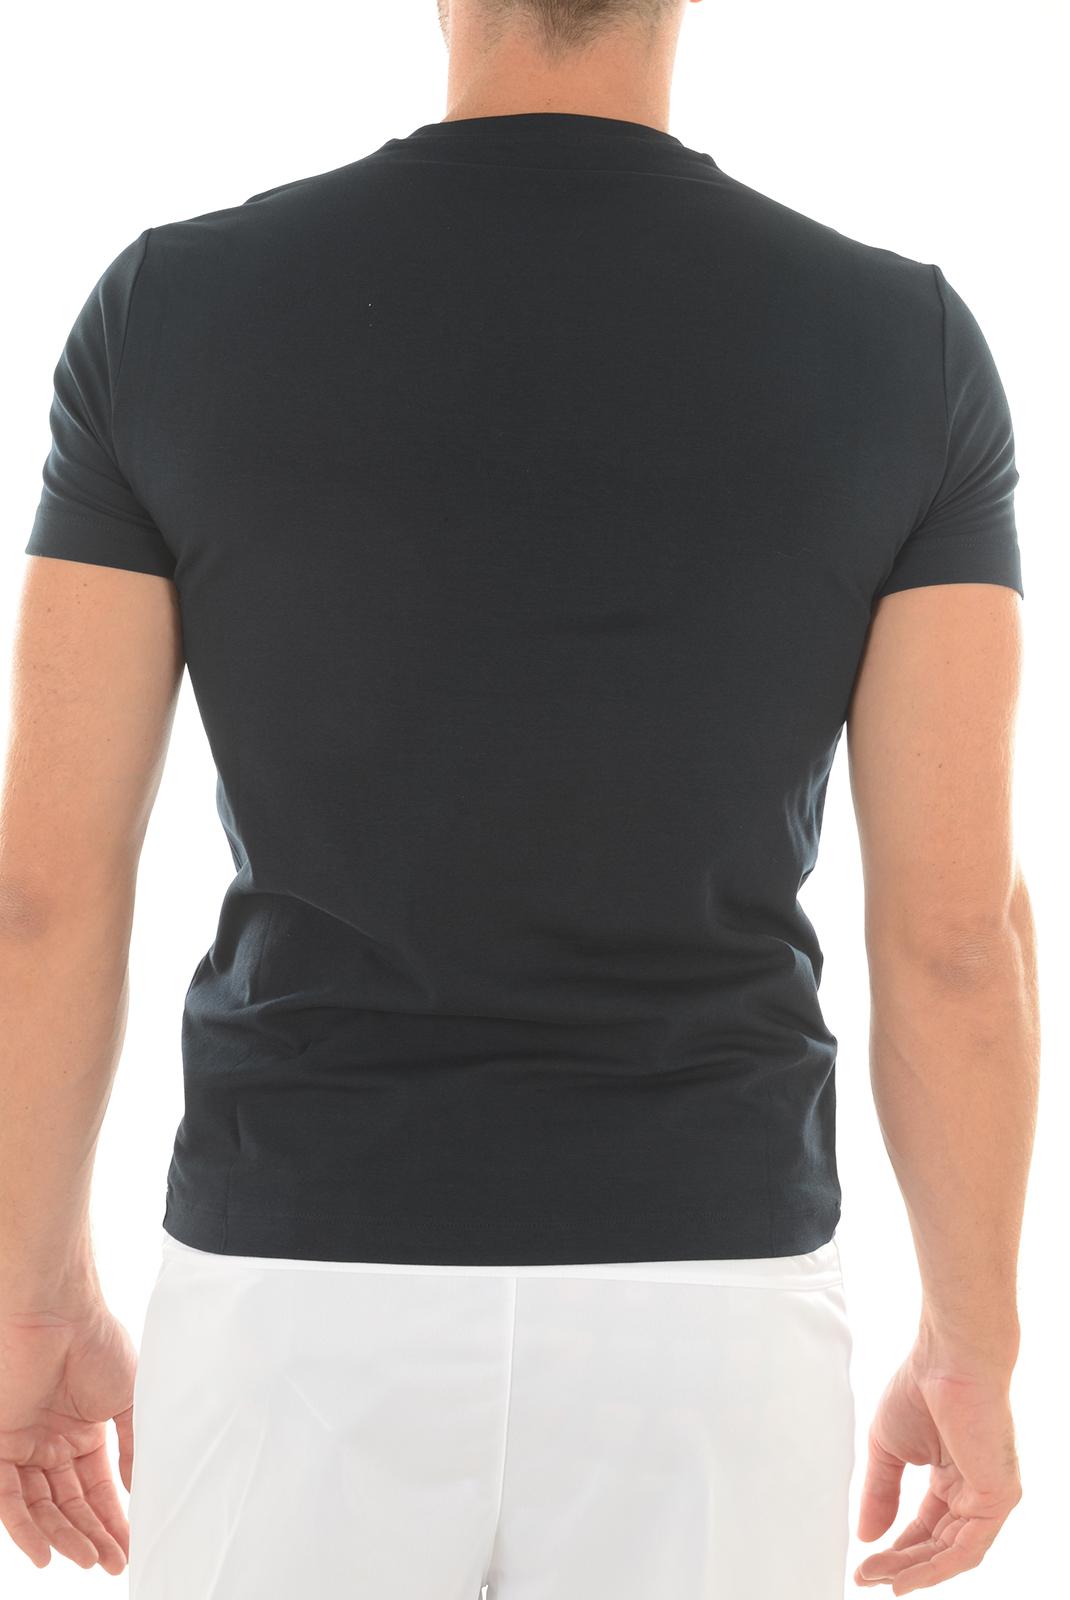 Tee-shirts  Emporio armani 273908 6P206 02836 DARK BLUE